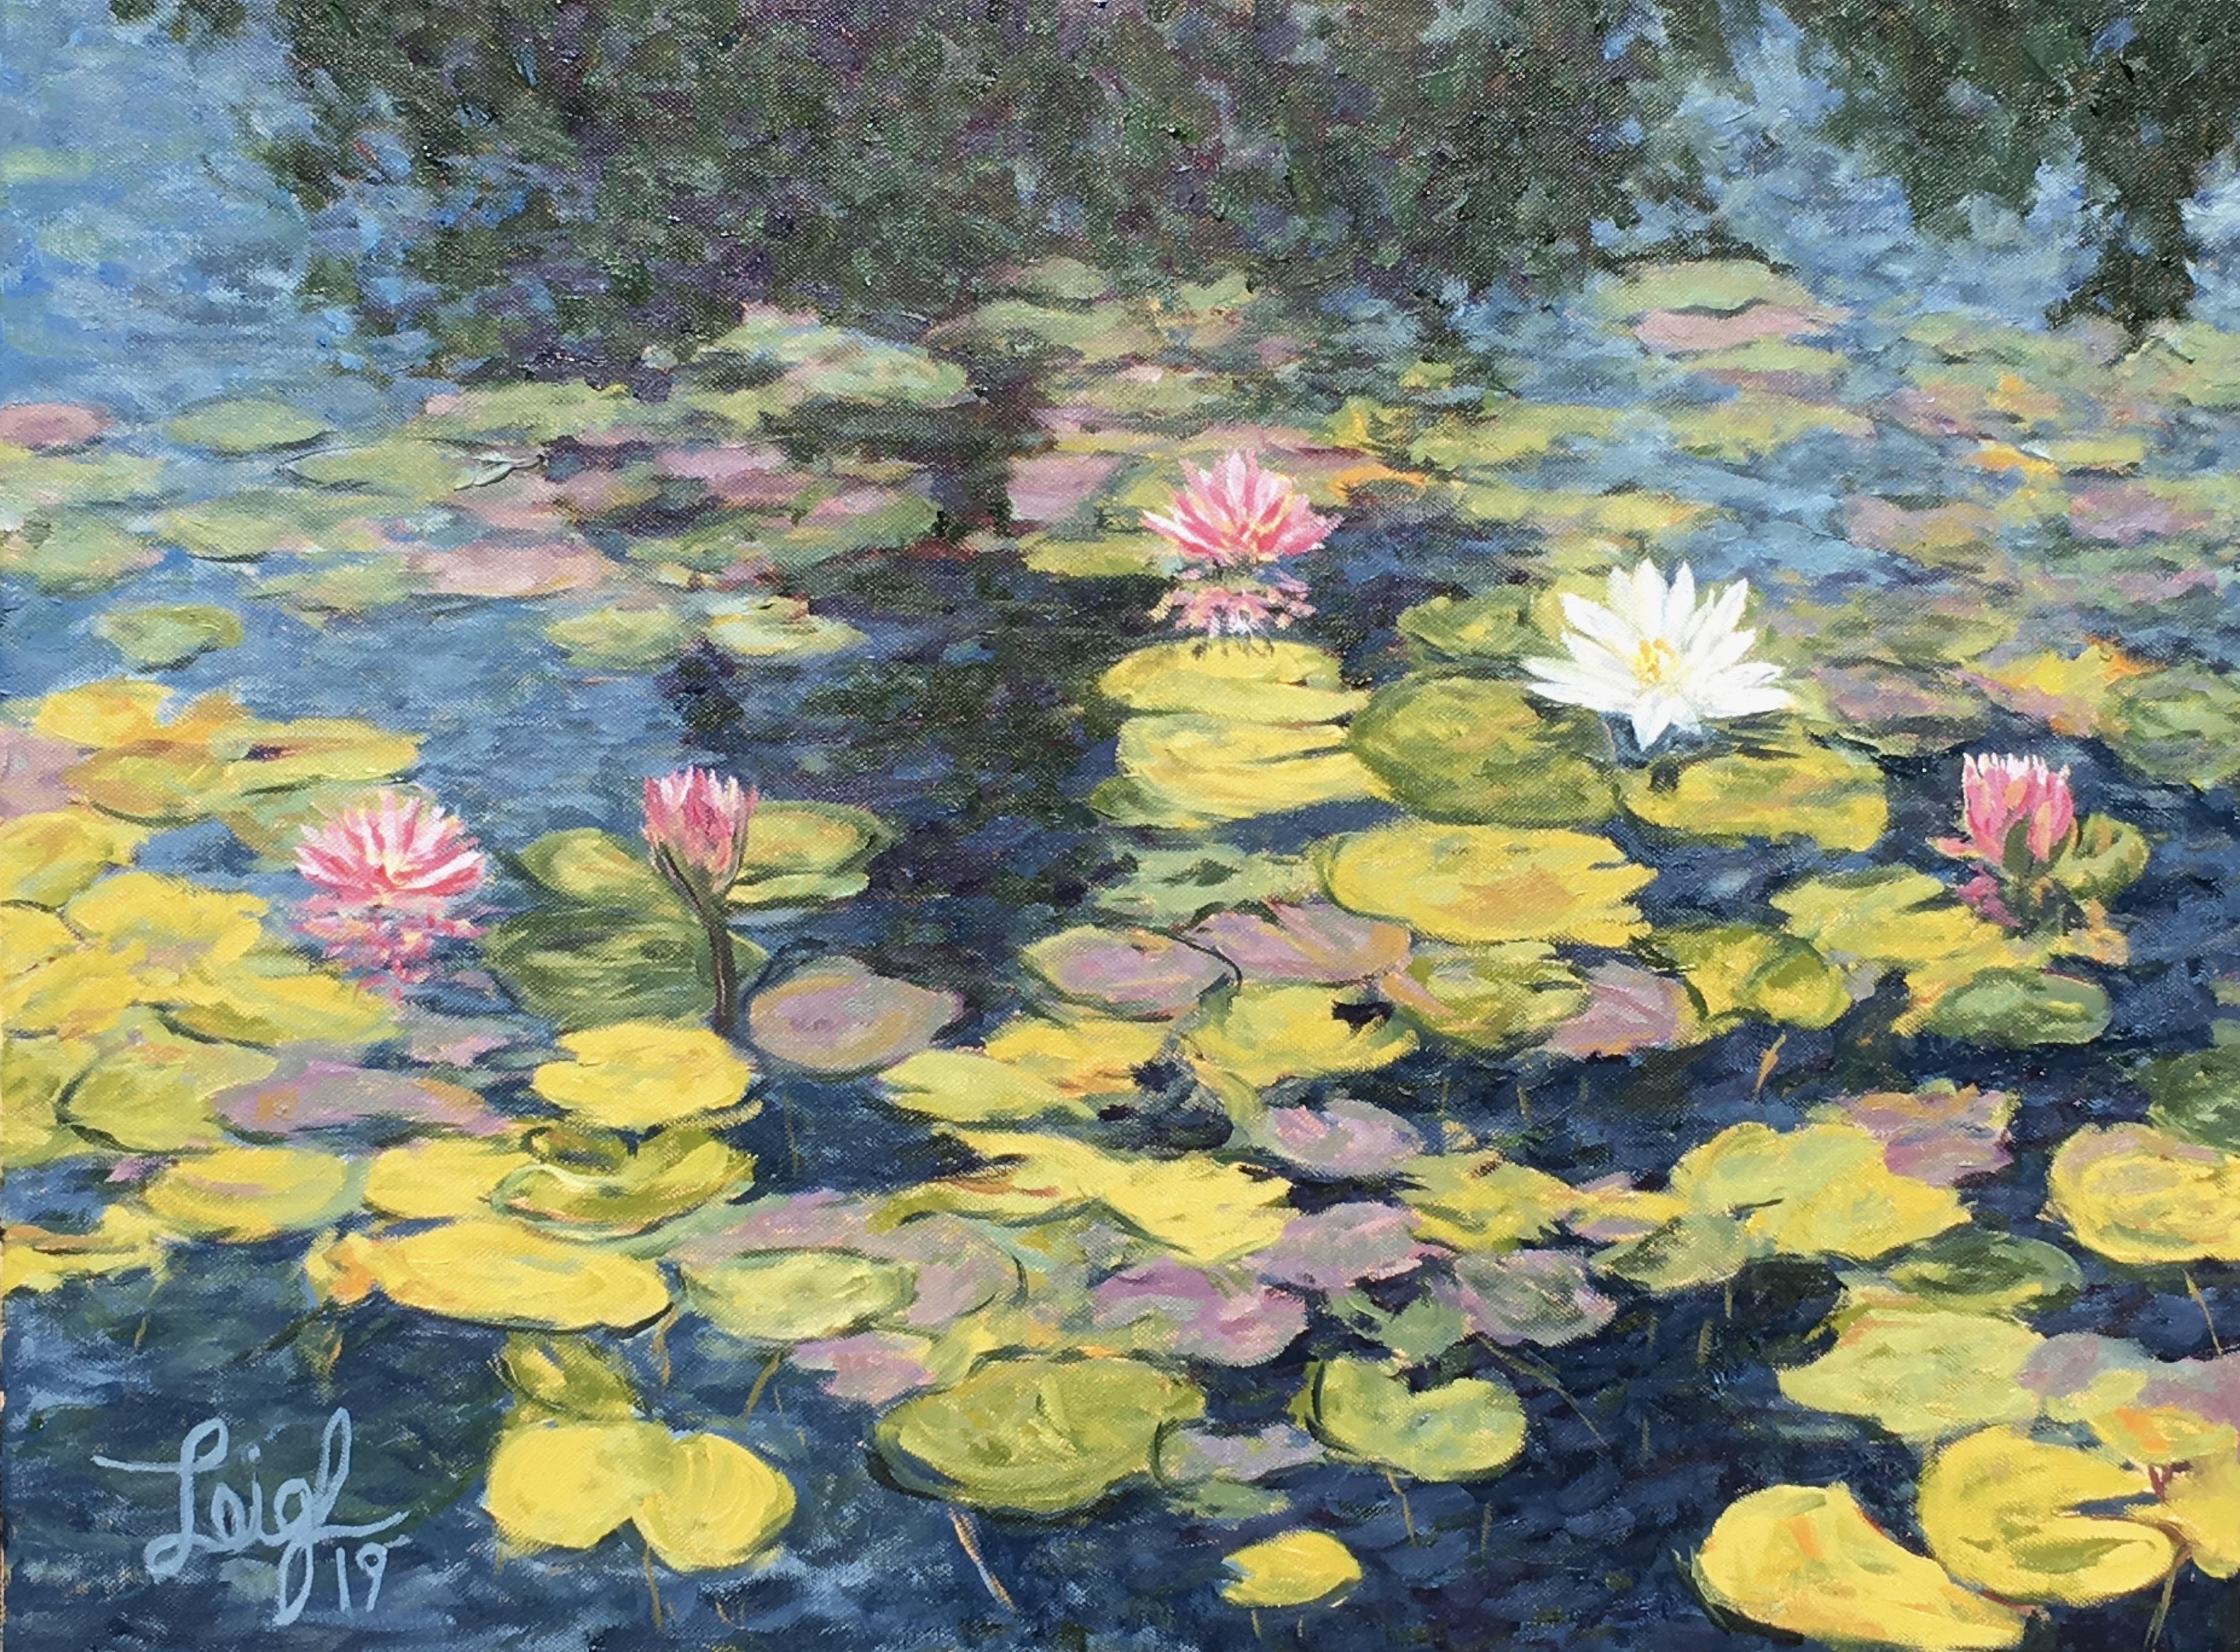 Water lilies in Balboa Park #2  ~  Annie Levowitz, Tijuana, Mexico 2019  •  24 x 18